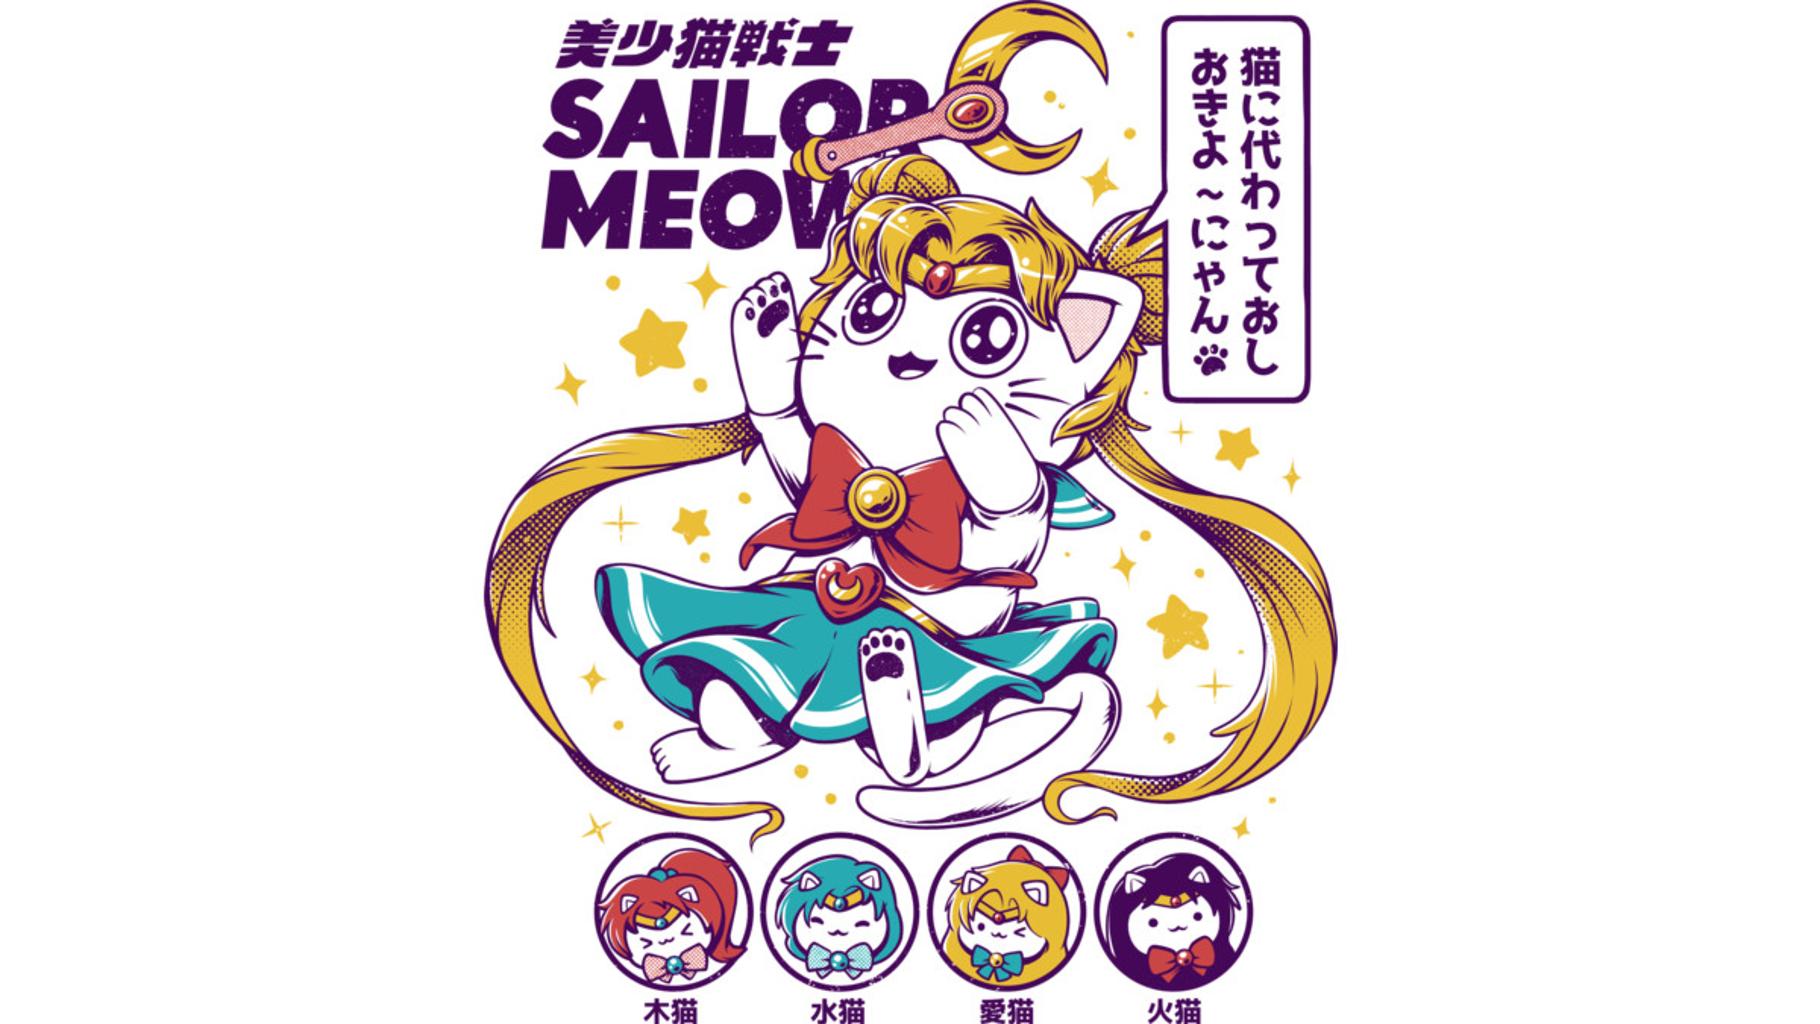 Design by Humans: Sailor Meow